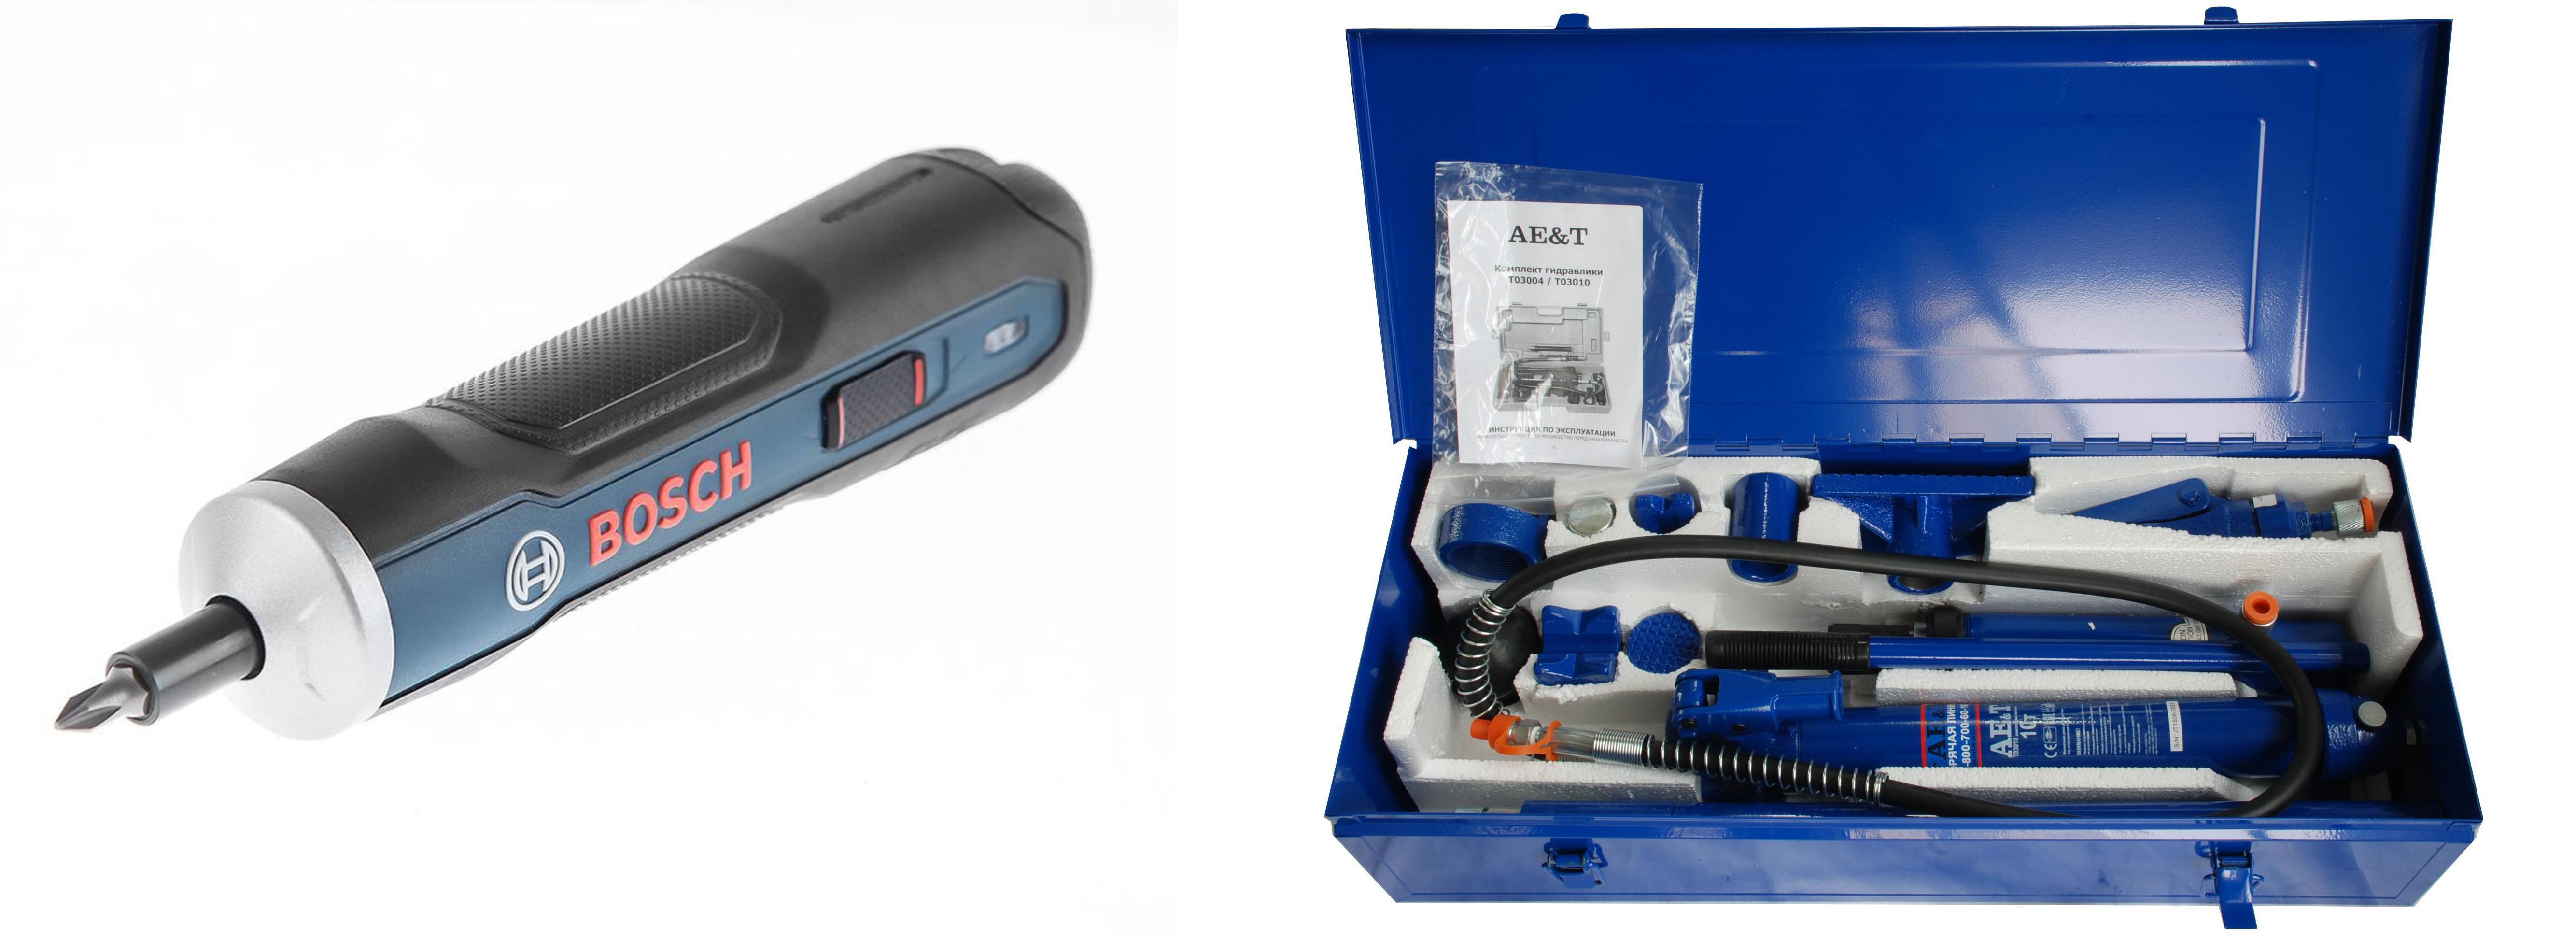 Набор Ae&t рихтовочный t03010 +Отвертка аккумуляторная go kit 0.601.9h2.021